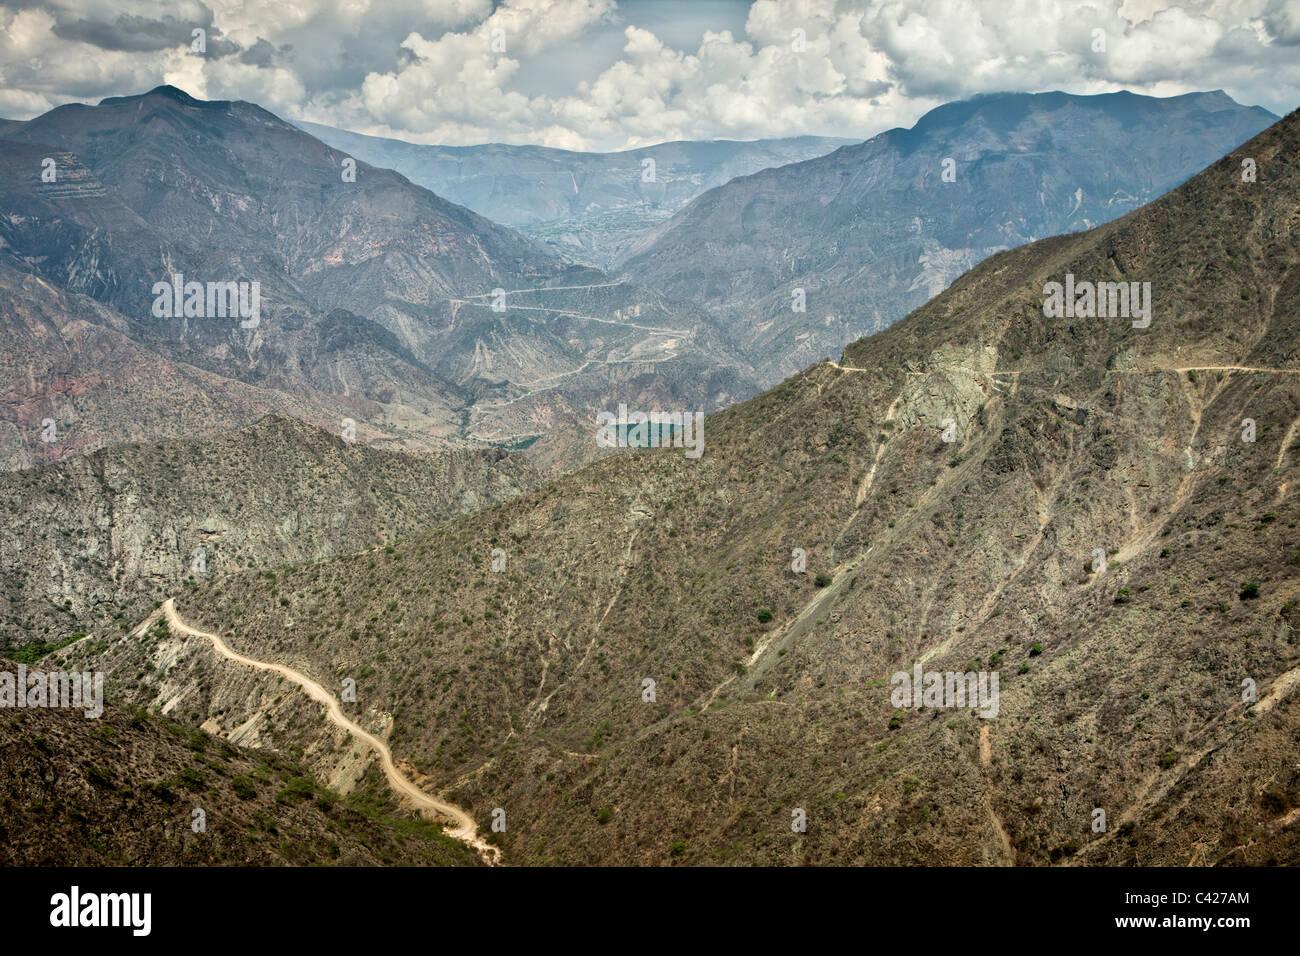 Peru, Leymebamba, Road to Cajamarca. View from Calla Calla Pass. (3600 m). - Stock Image